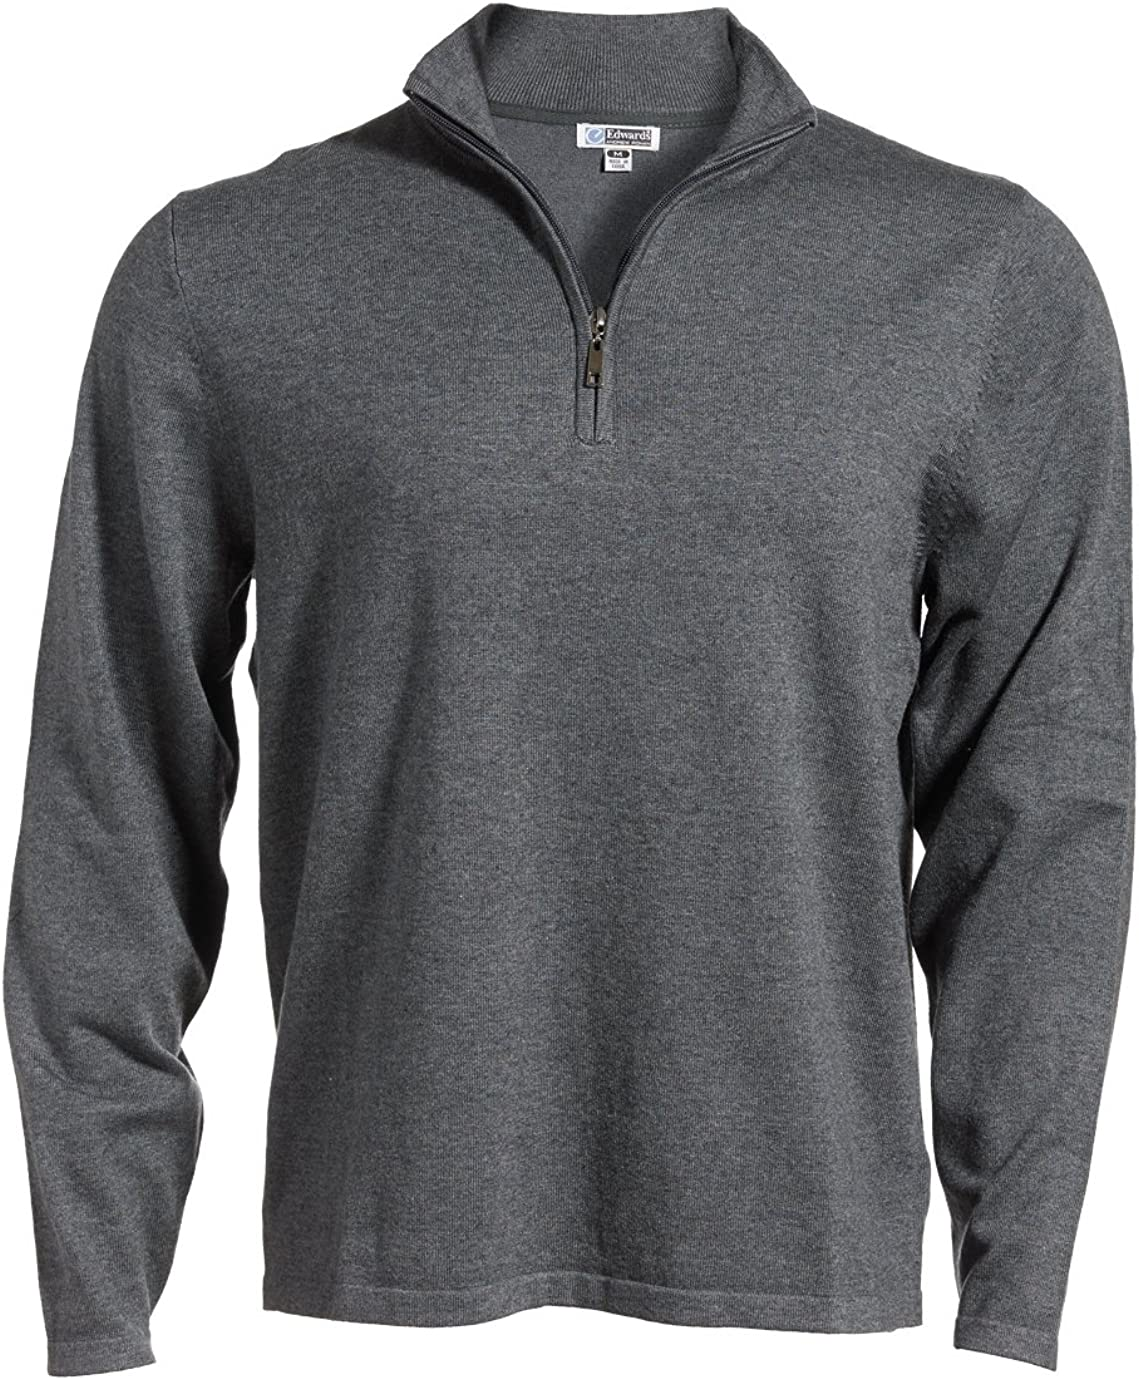 Edwards Long Sleeve 1 4 Gauge Ranking TOP7 Sweater Zip Fine Purchase